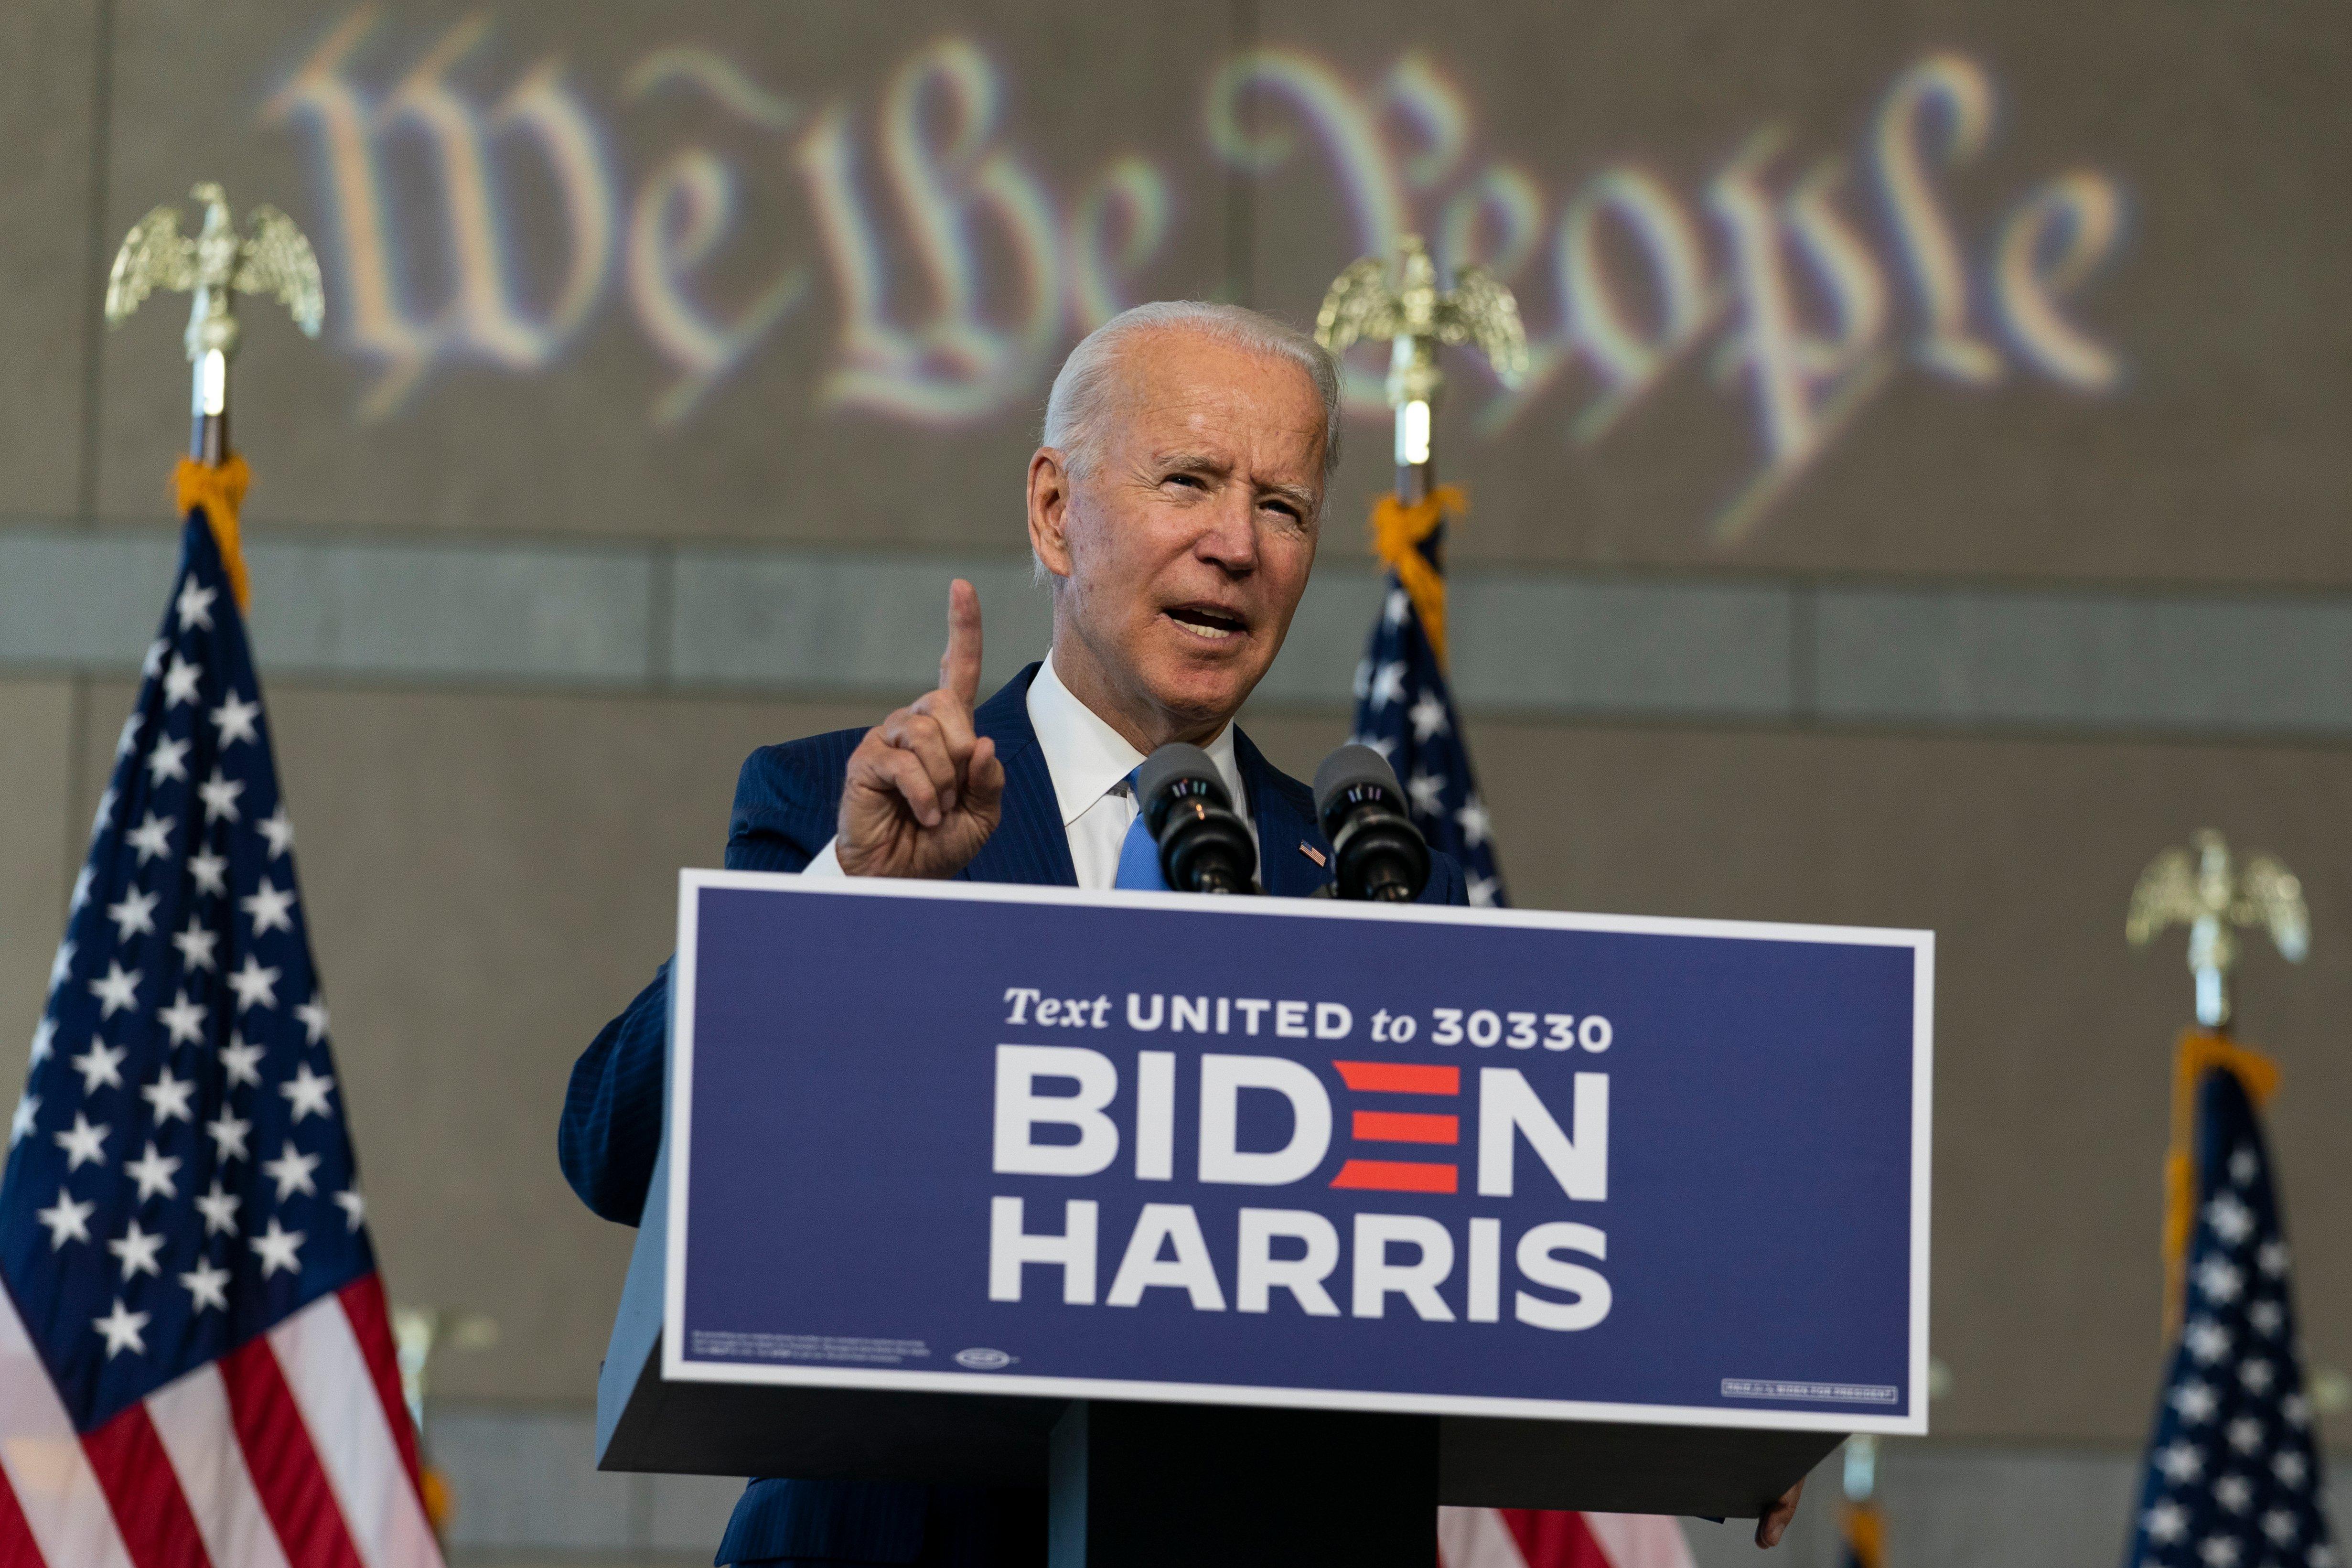 Biden urges Republican senators not to push through a Ginsburg nominee